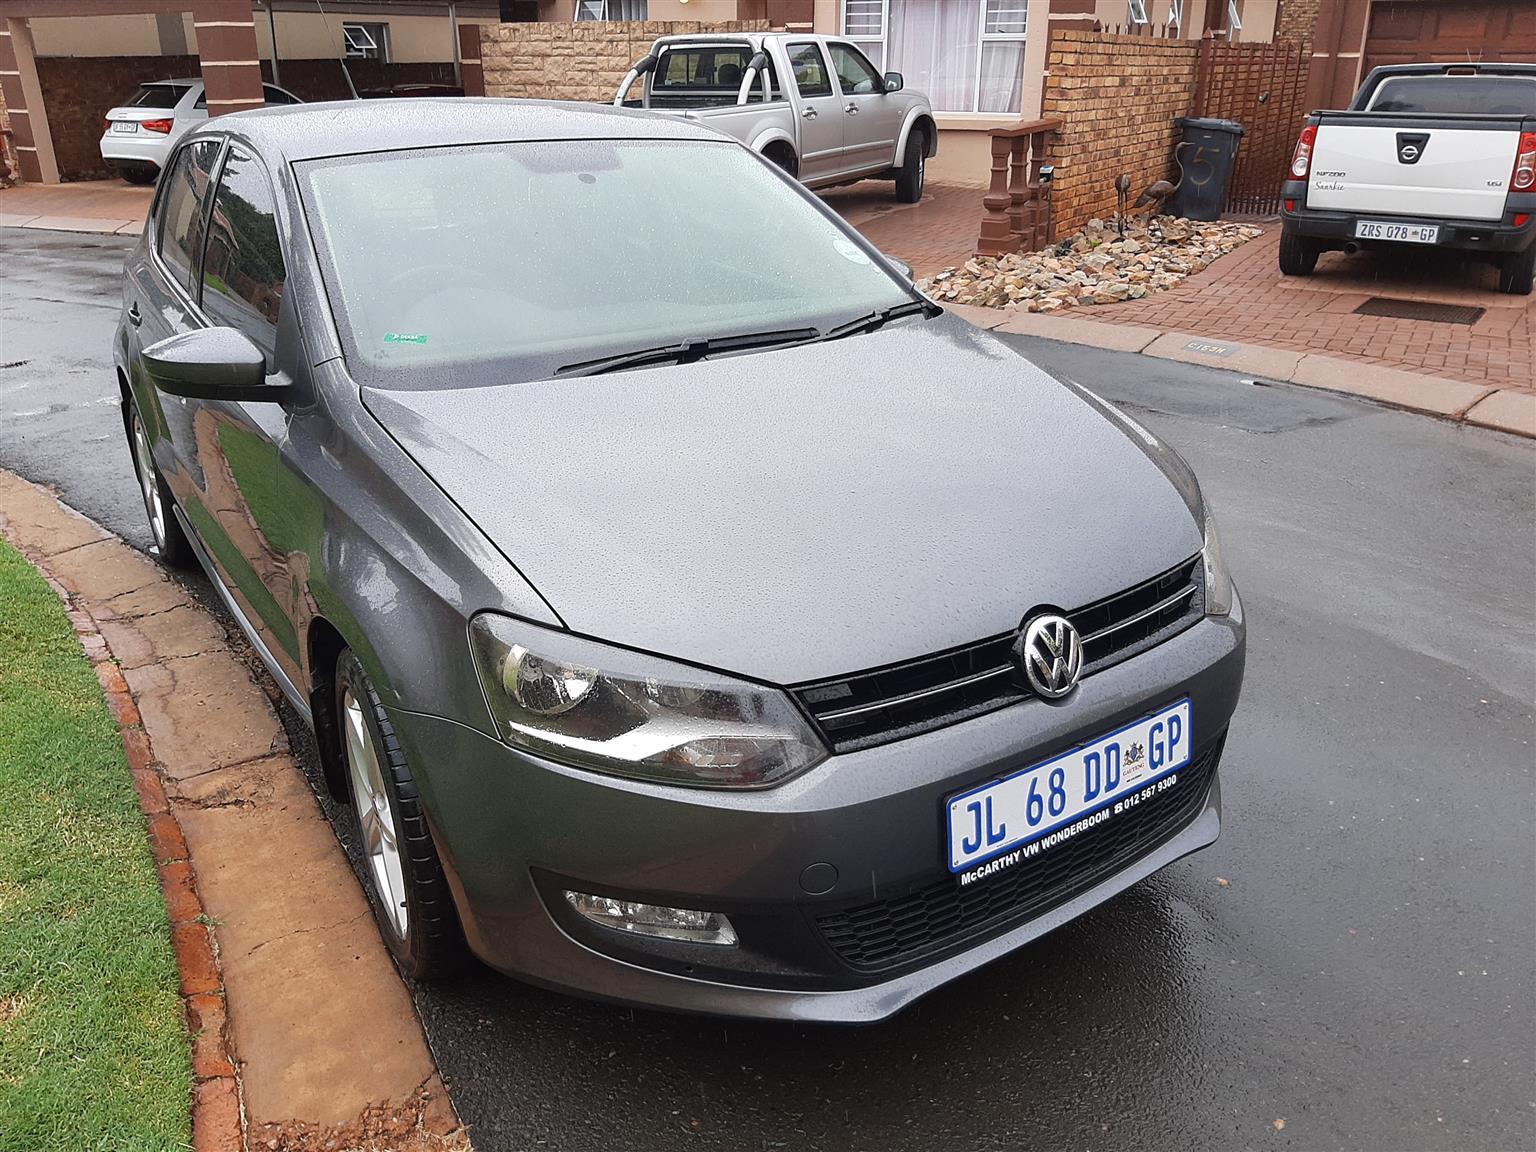 2014 VW Polo Vivo hatch 5-door POLO VIVO 1.4 COMFORTLINE (5DR)